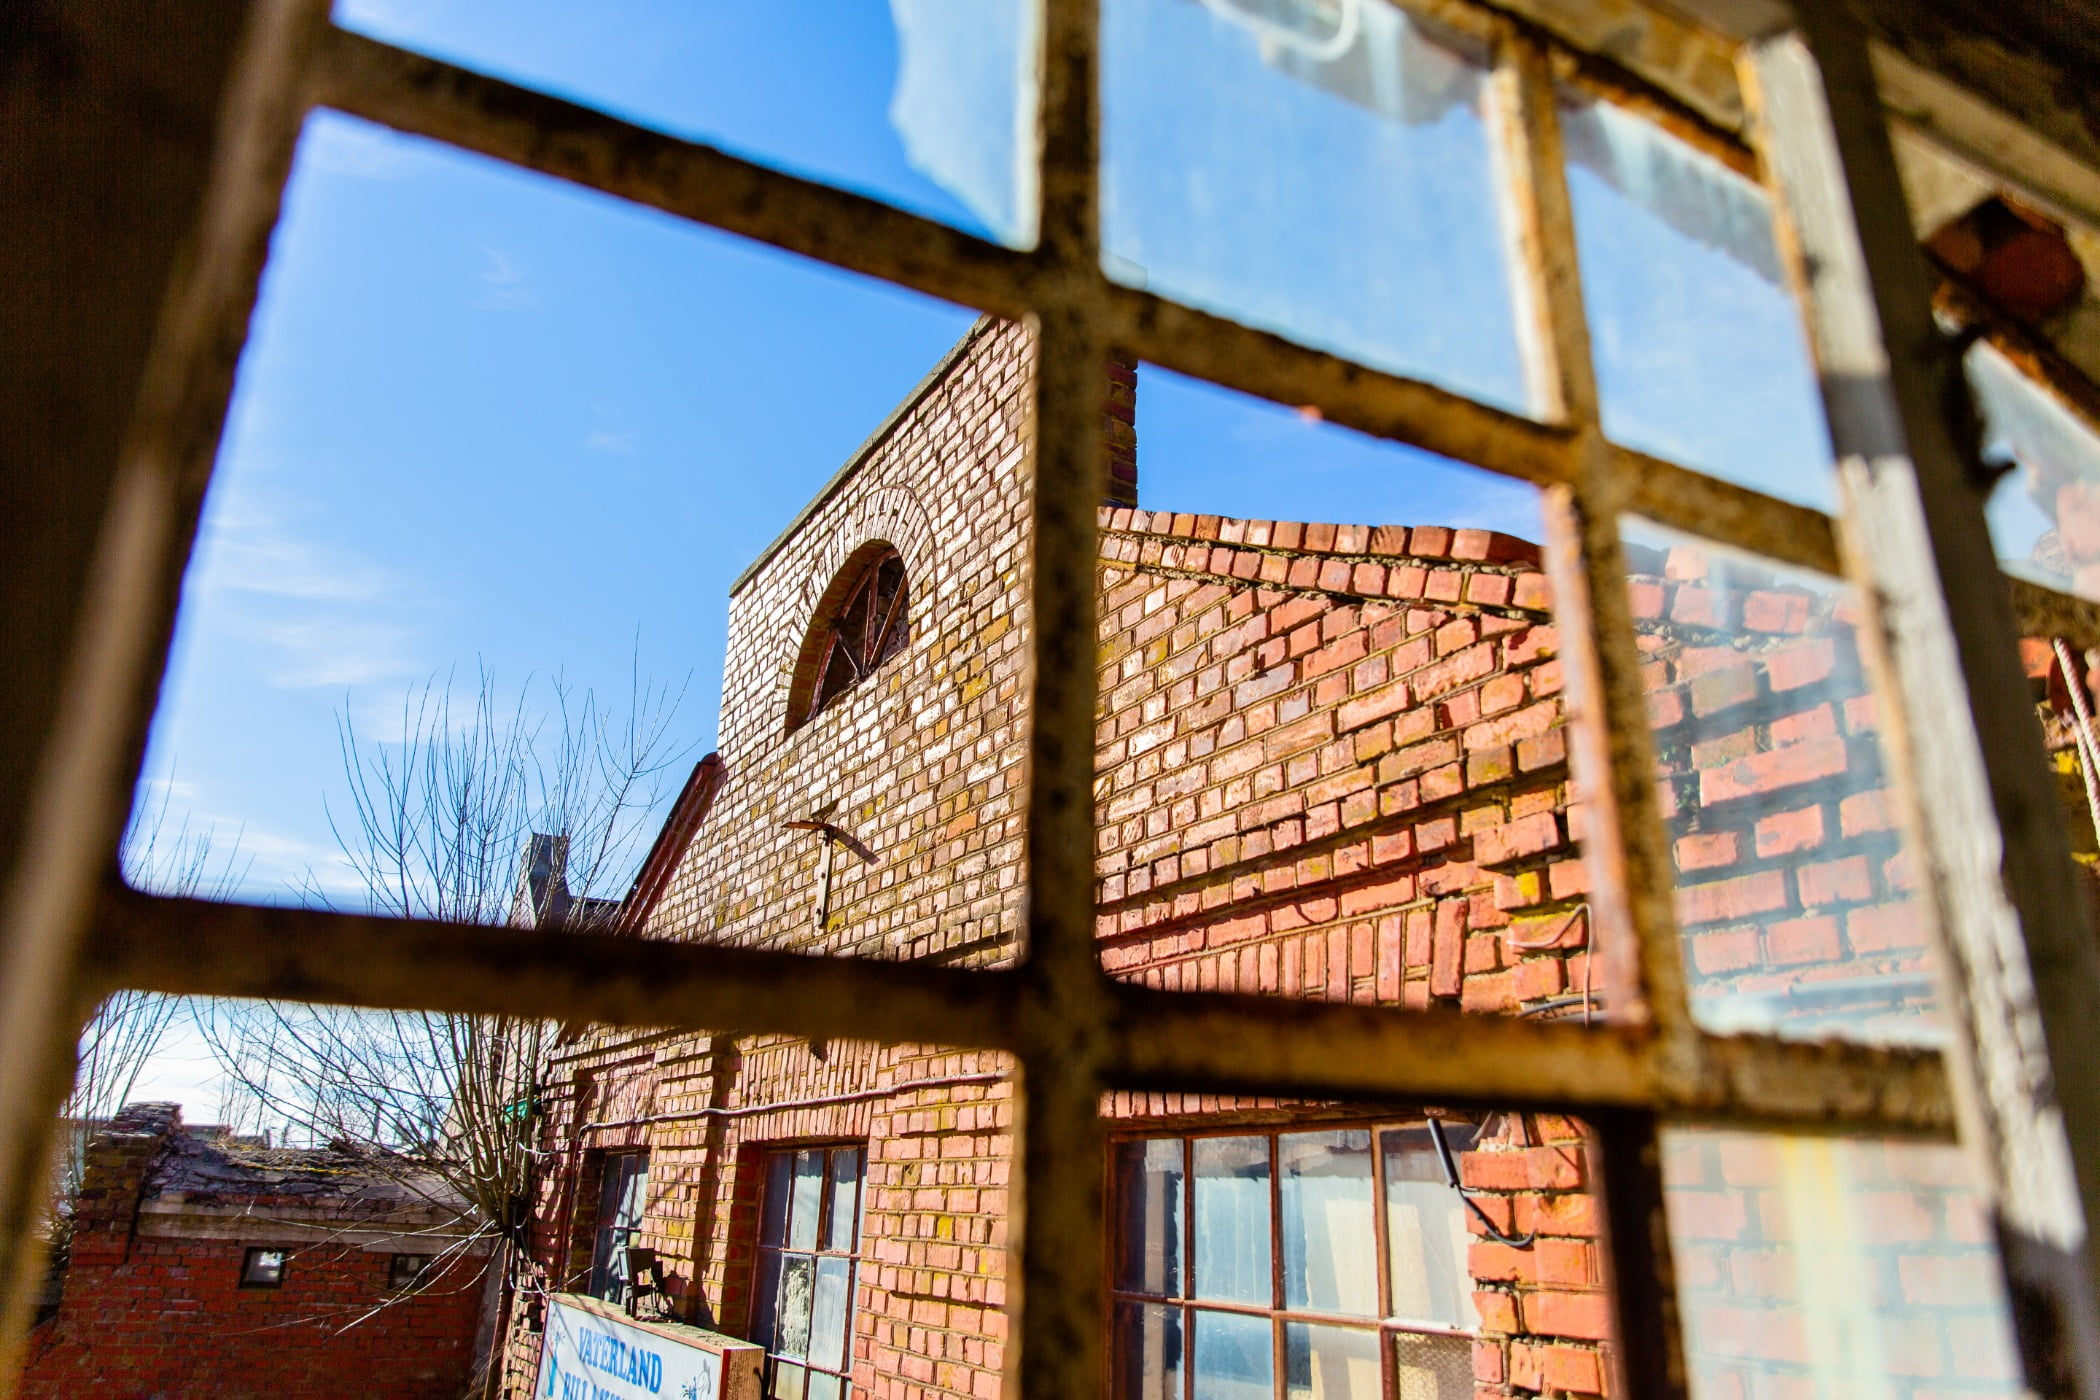 Sky, Daytime, Window, Fixture, Wood, Brickwork, Lighting, Sunlight, Brick, Tree